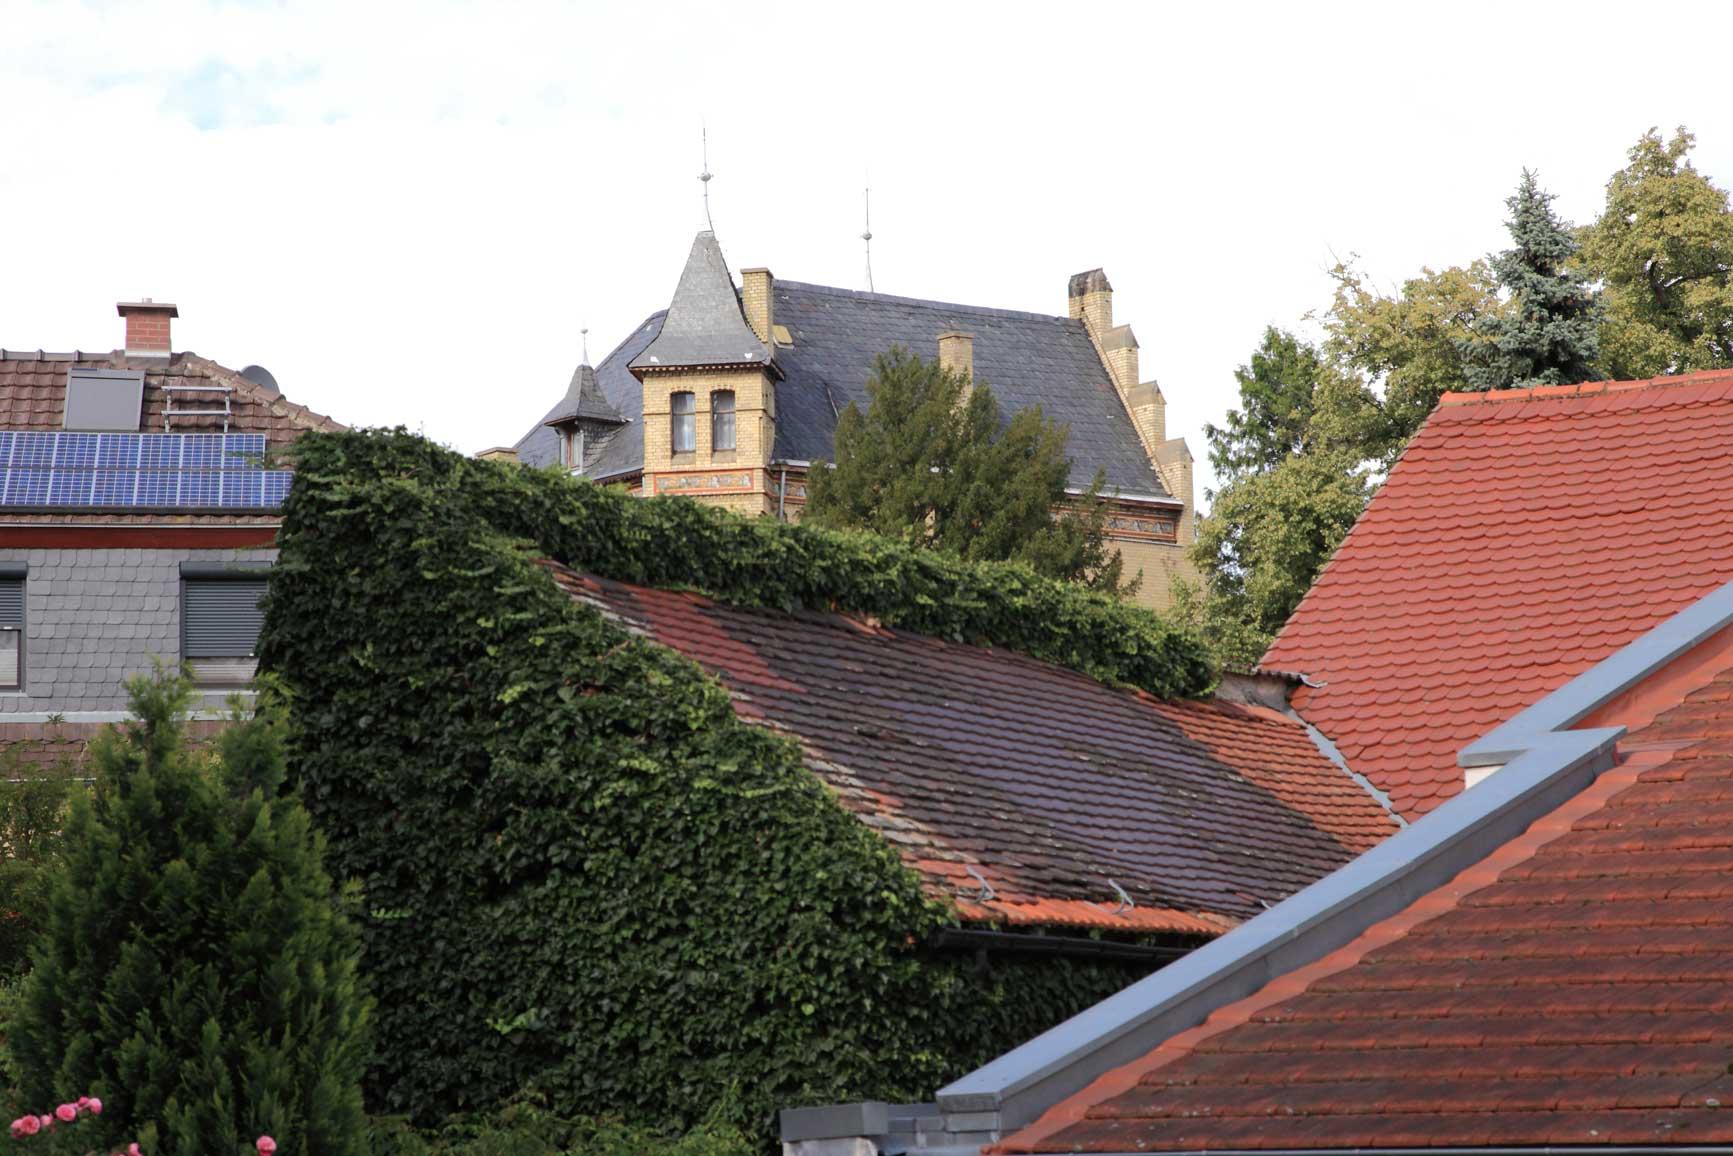 Rhine-14-08-14_18-40-16